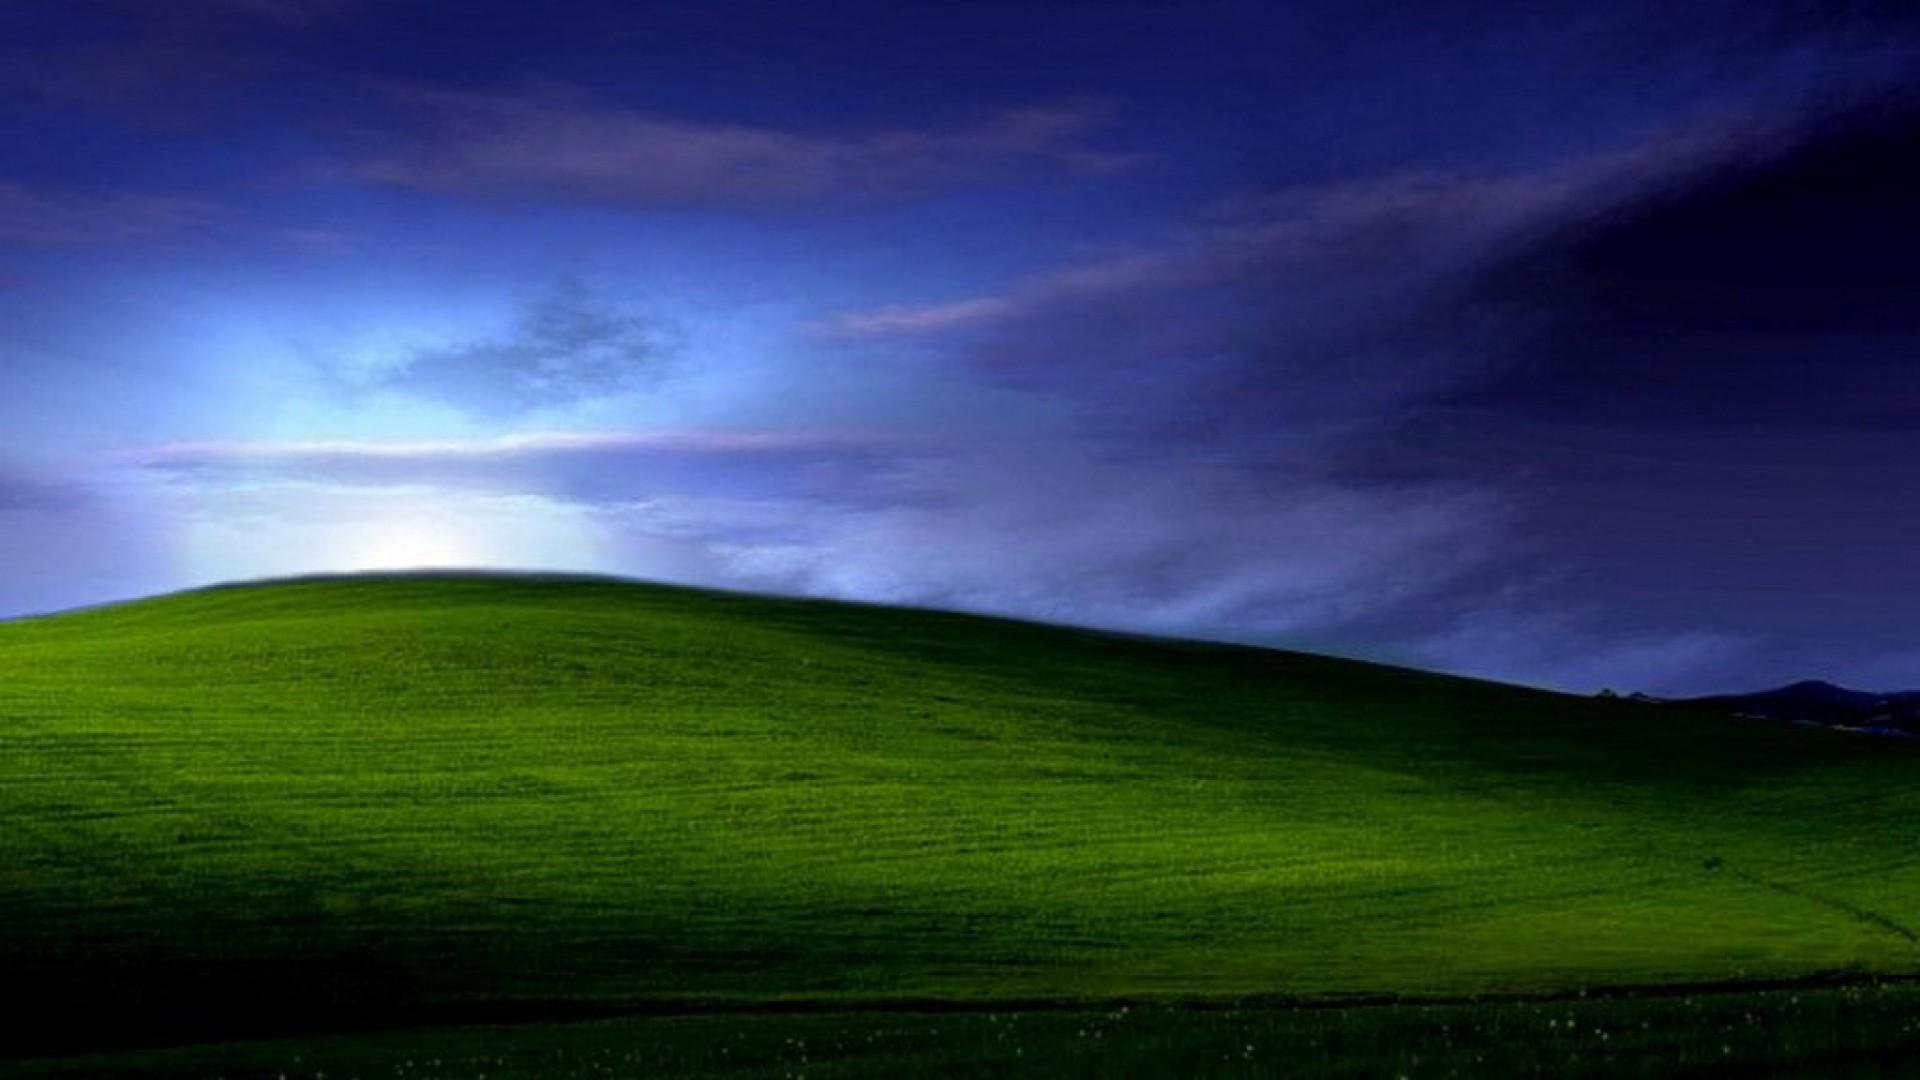 Windows xp wallpaper bliss wallpapersafari for Window xp wallpaper